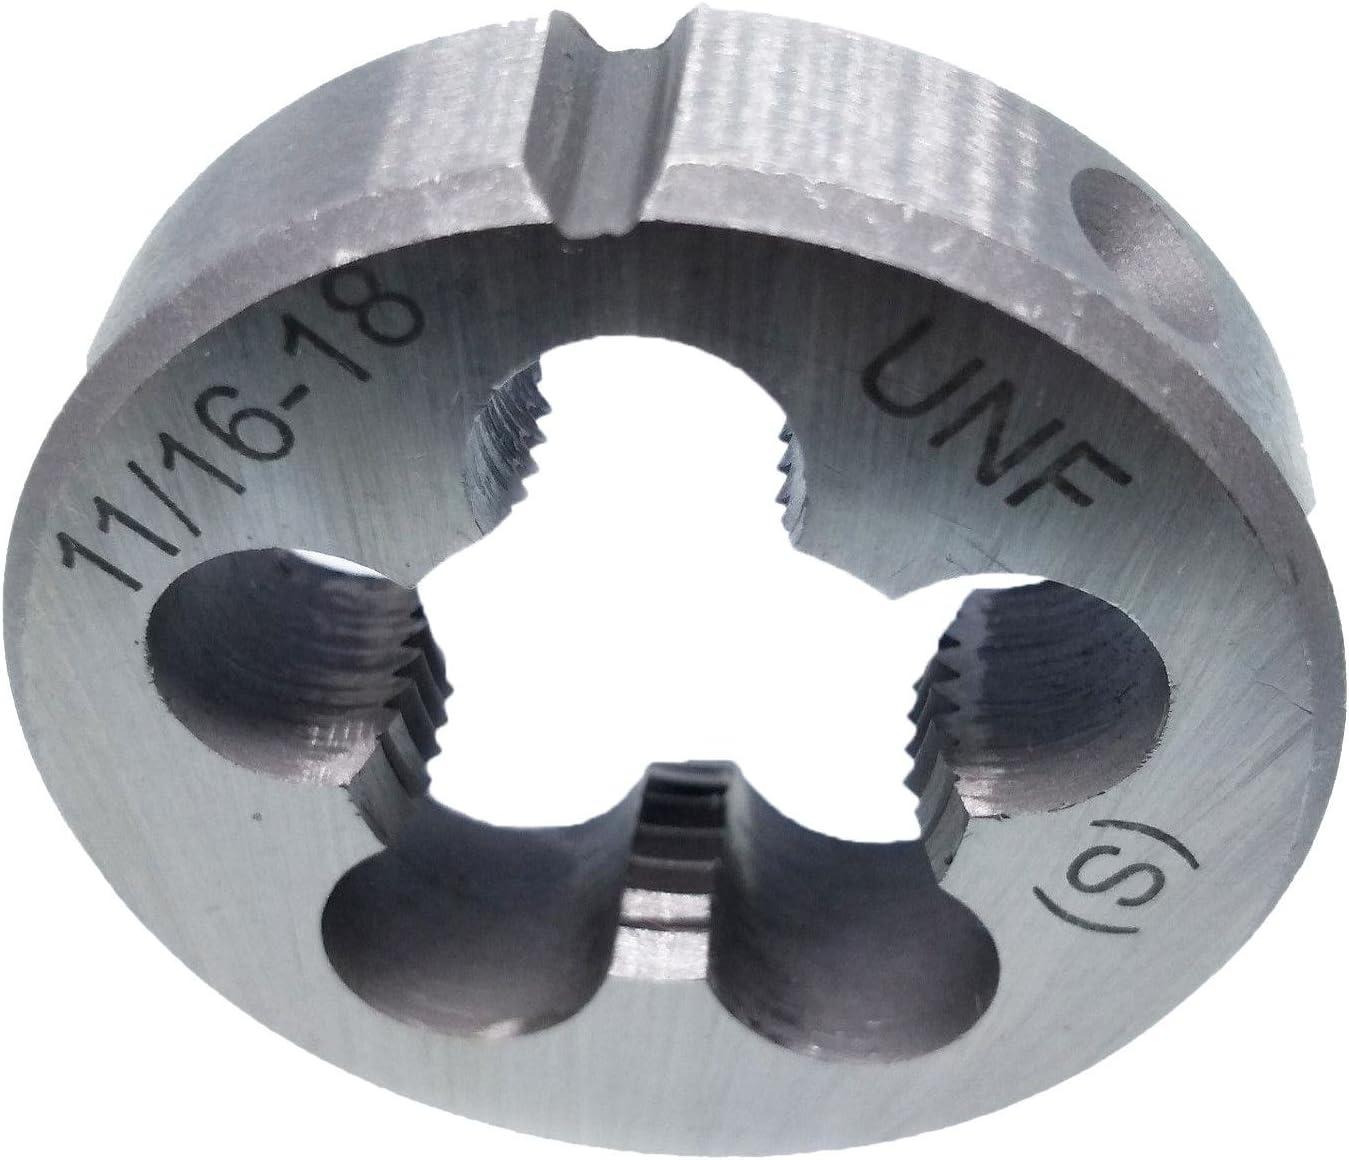 0.6mm Cutting Diameter 40mm Overall Length YG-1 G8A36 Carbide Micro Corner Rounding End Mill 30 Deg Helix TIALN Multilayer Finish 3mm Shank Diameter 2 Flutes Metric